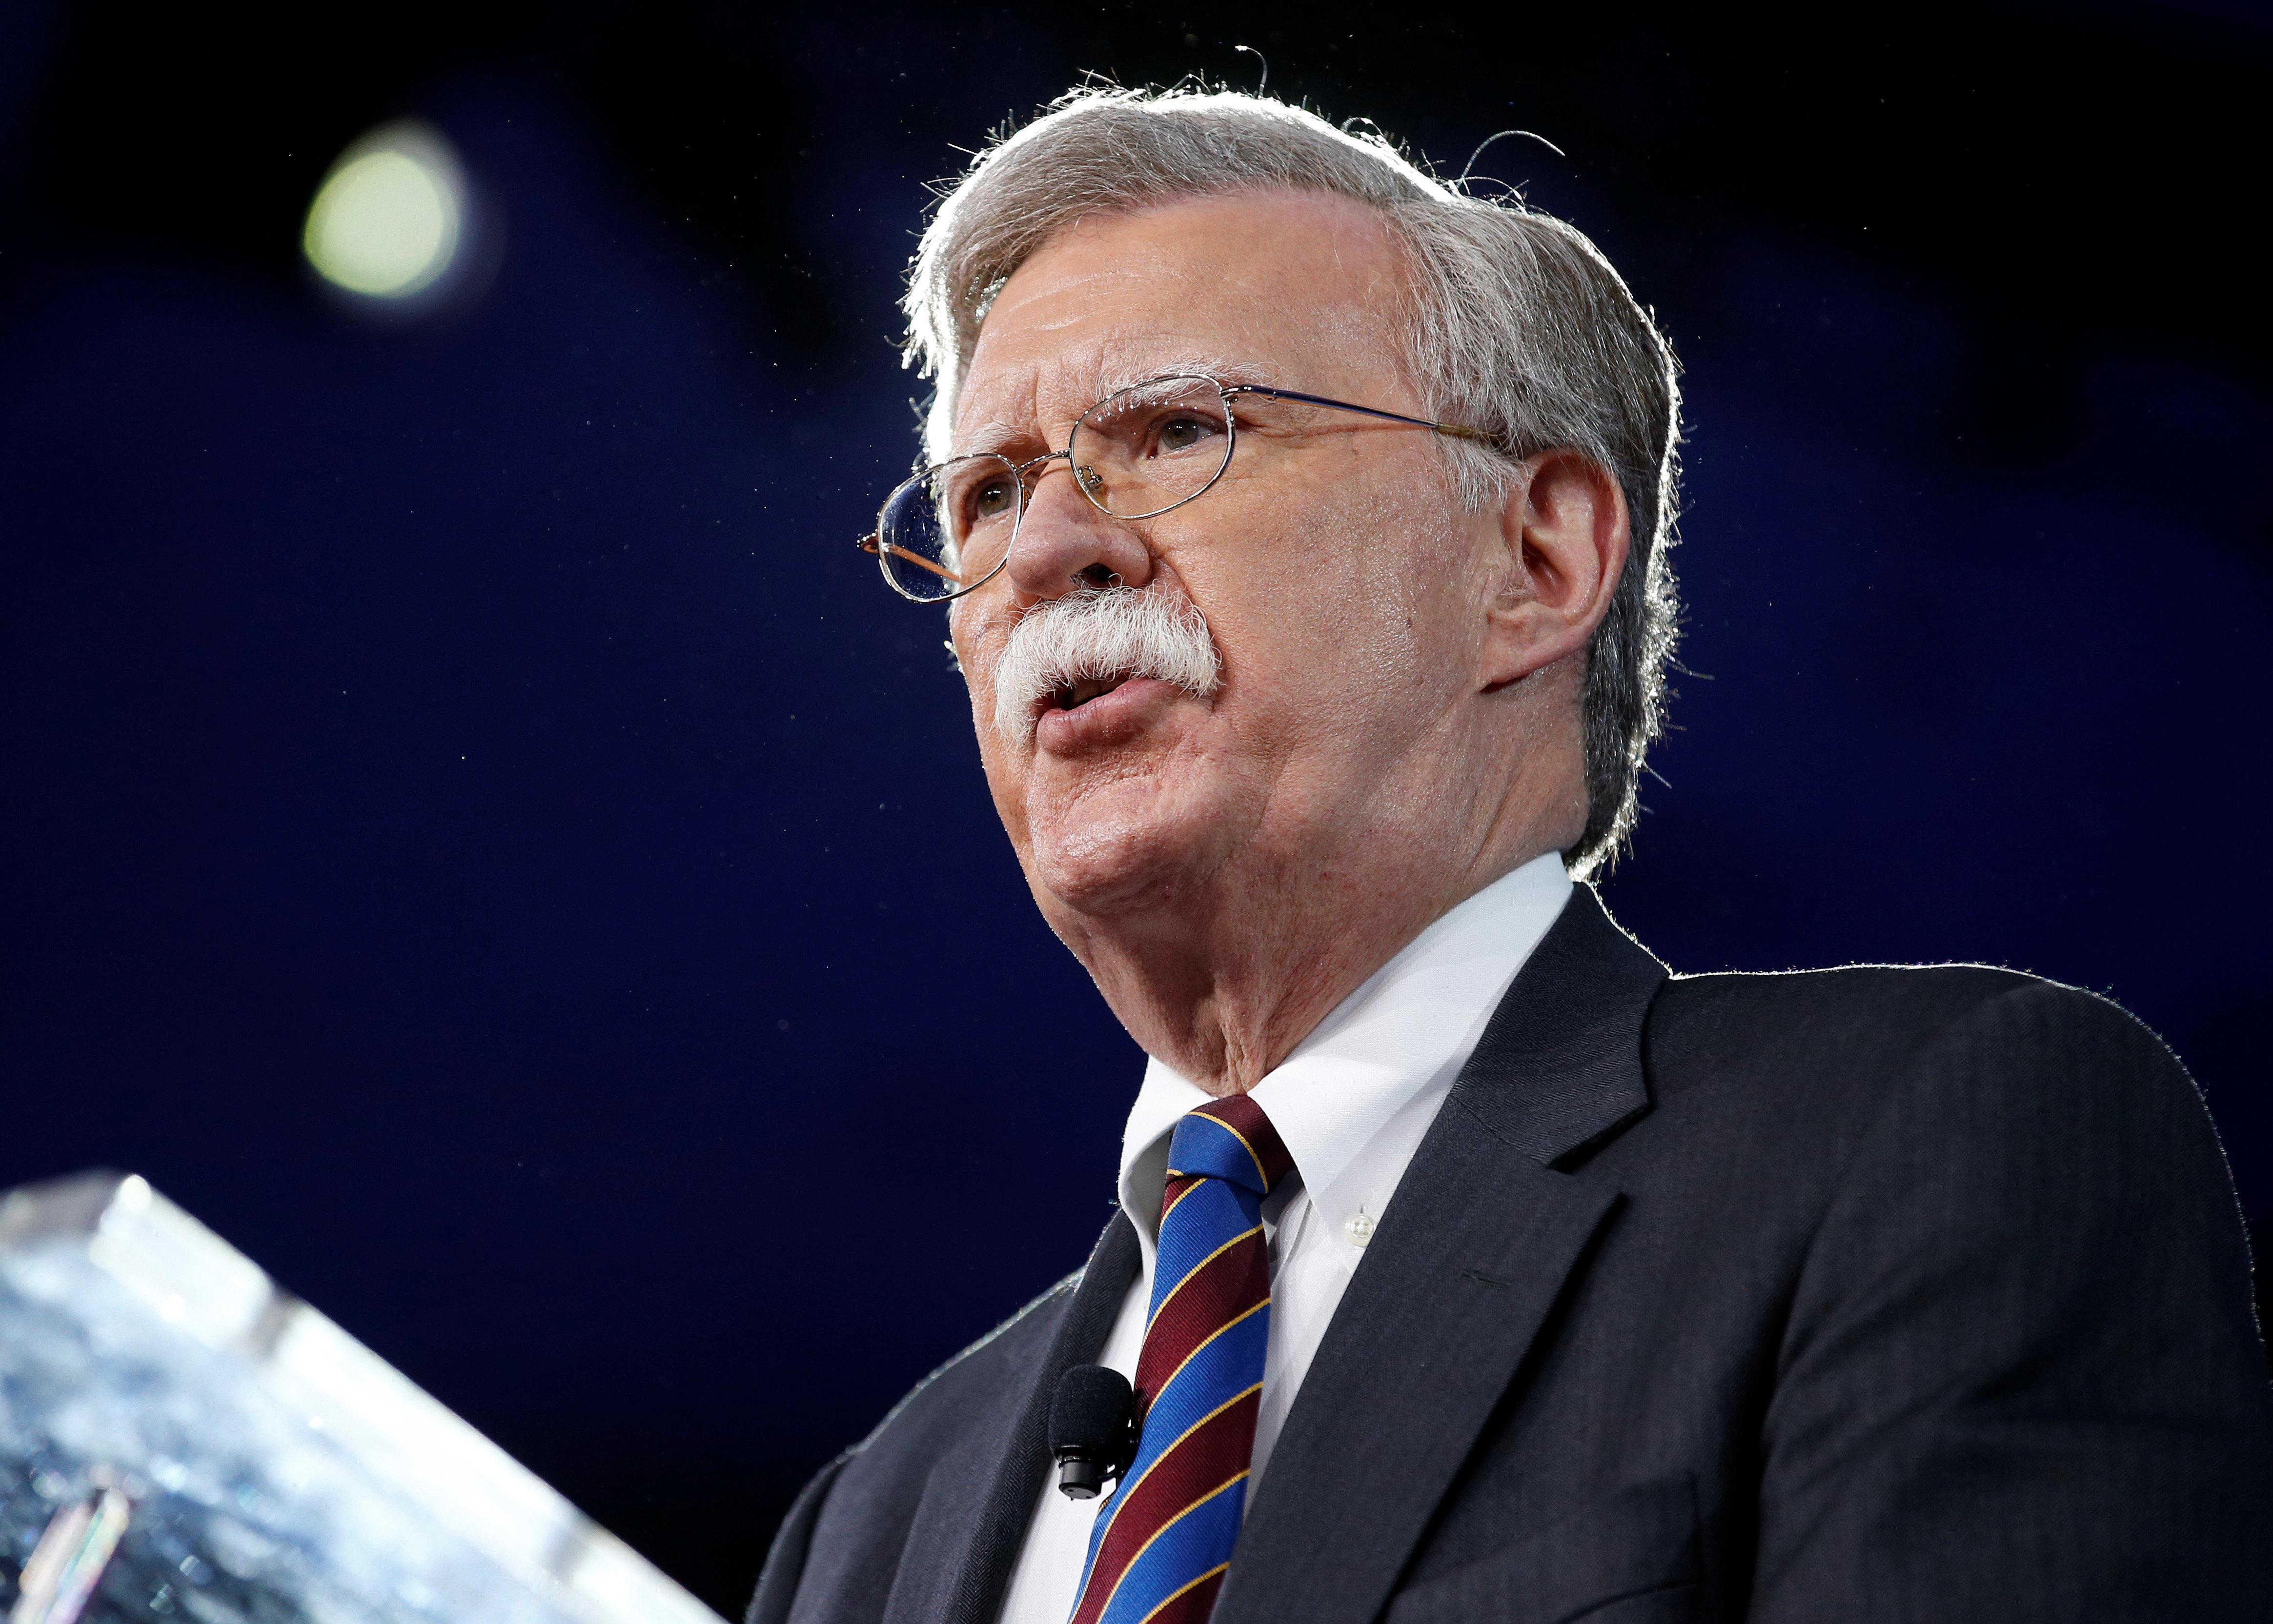 Tζον Μπόλτον: Οι ευρωπαίοι σύμμαχοι μας δεν έχουν κάνει αρκετά για να αντιμετωπιστεί ο κίνδυνος του